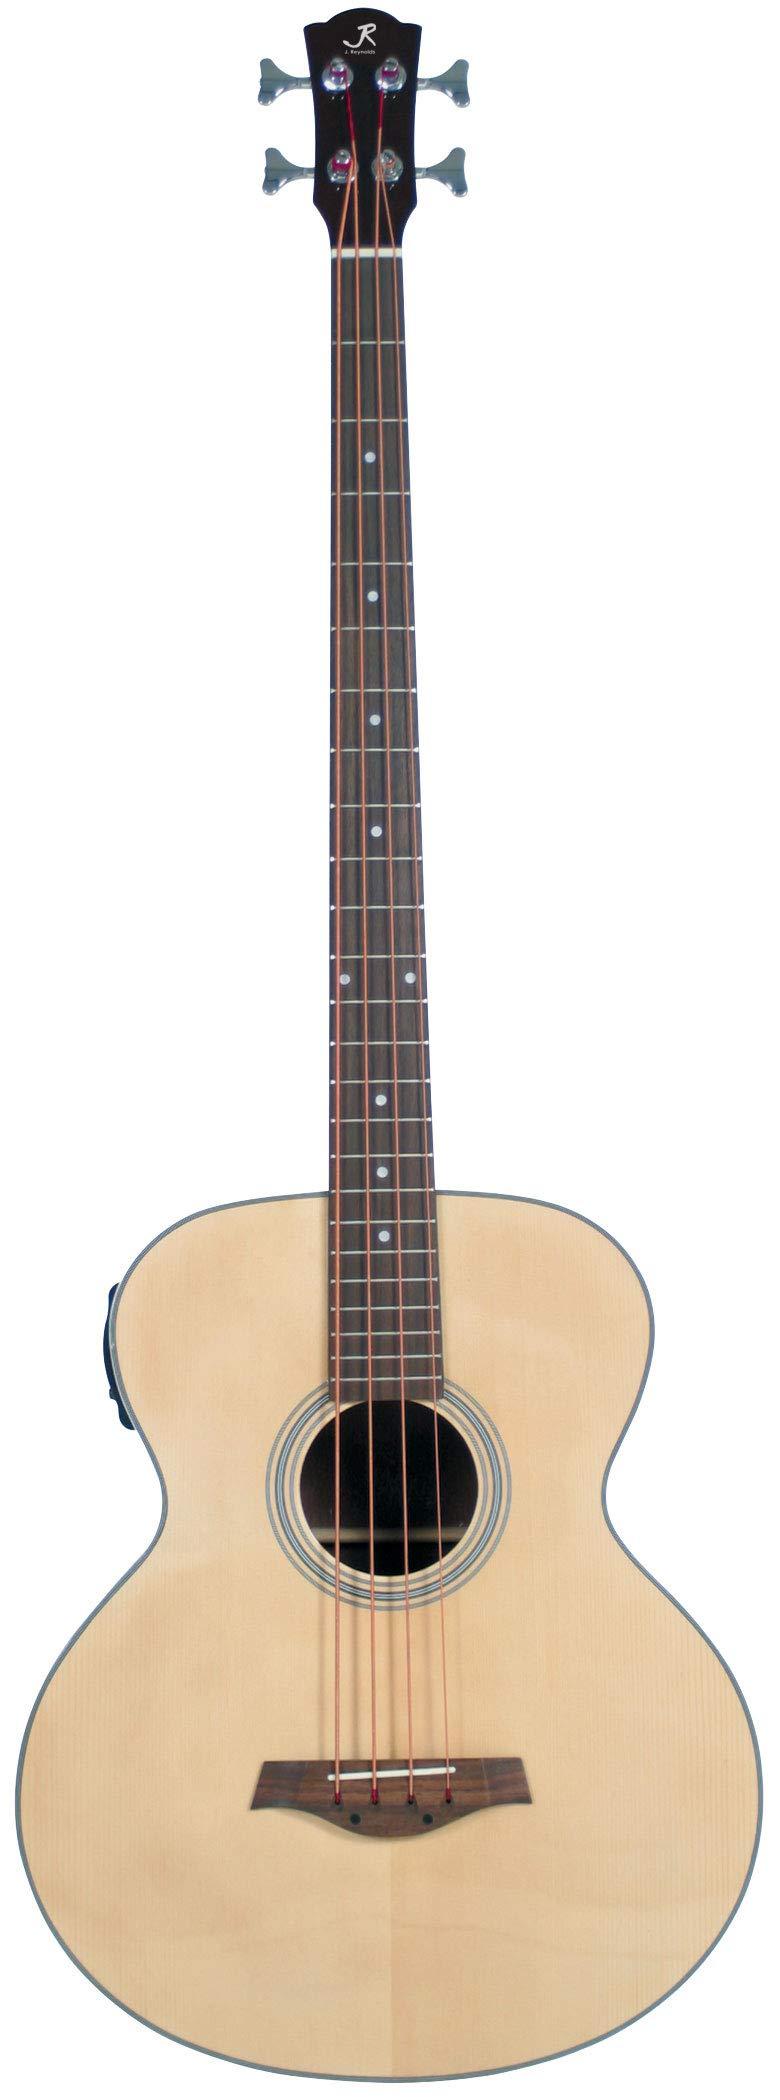 J Reynolds 4 String Acoustic Bass Guitar (JR1000-A-U)